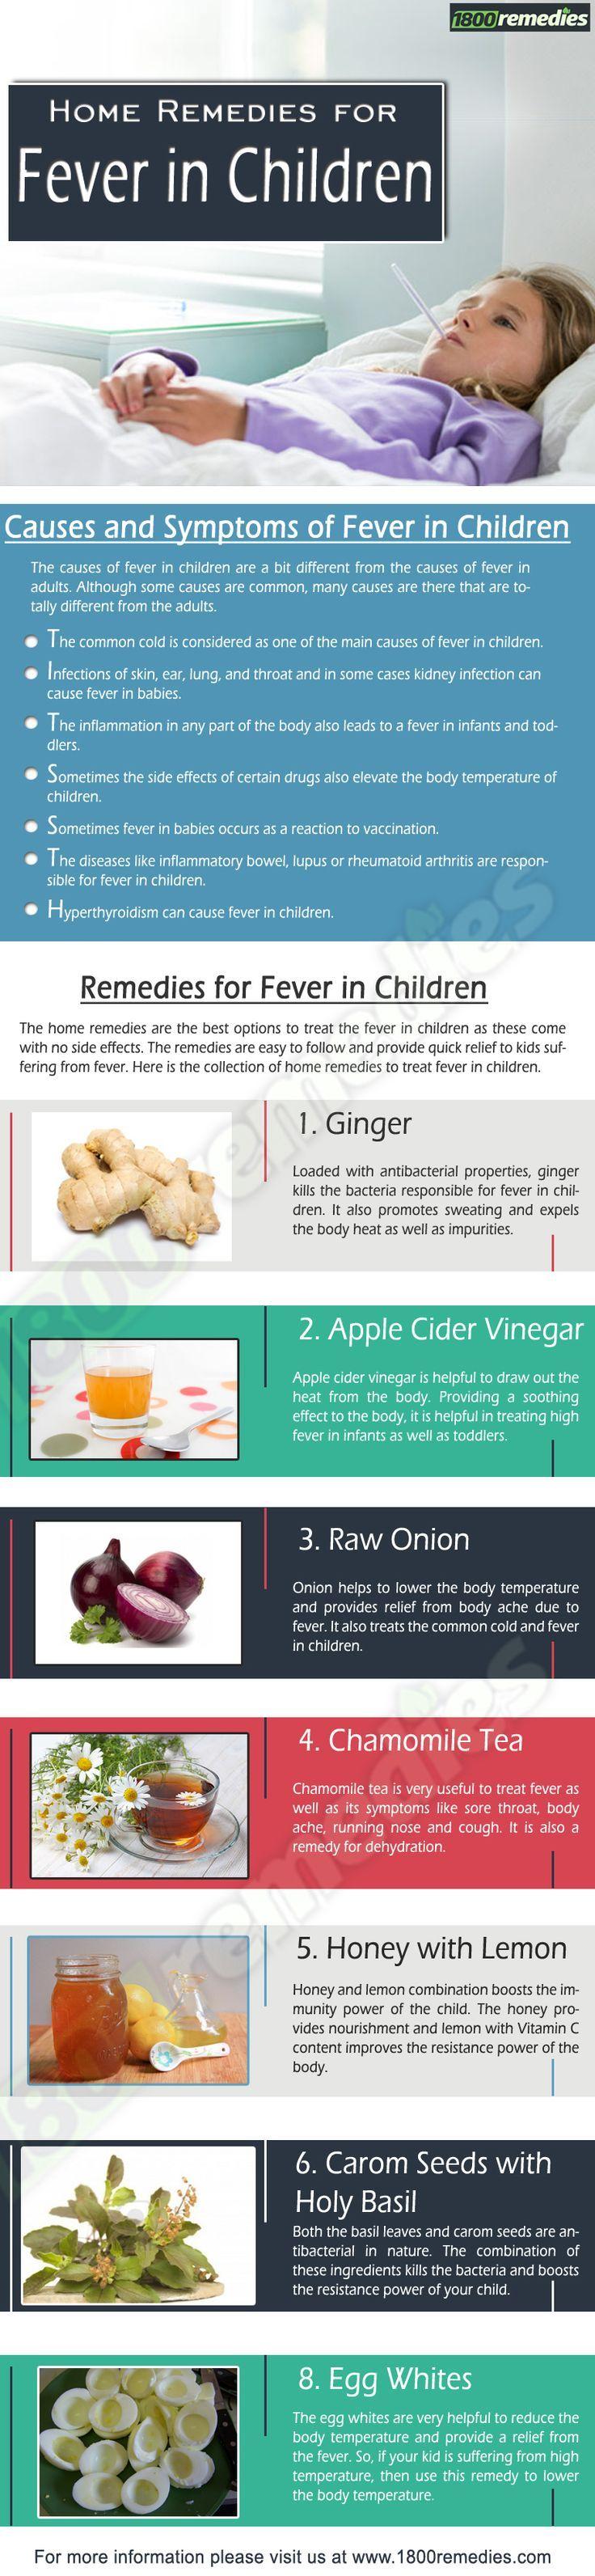 Home Remedies For Fever Home Remedies For Fever Fever Remedies Natural Remedies For Fever